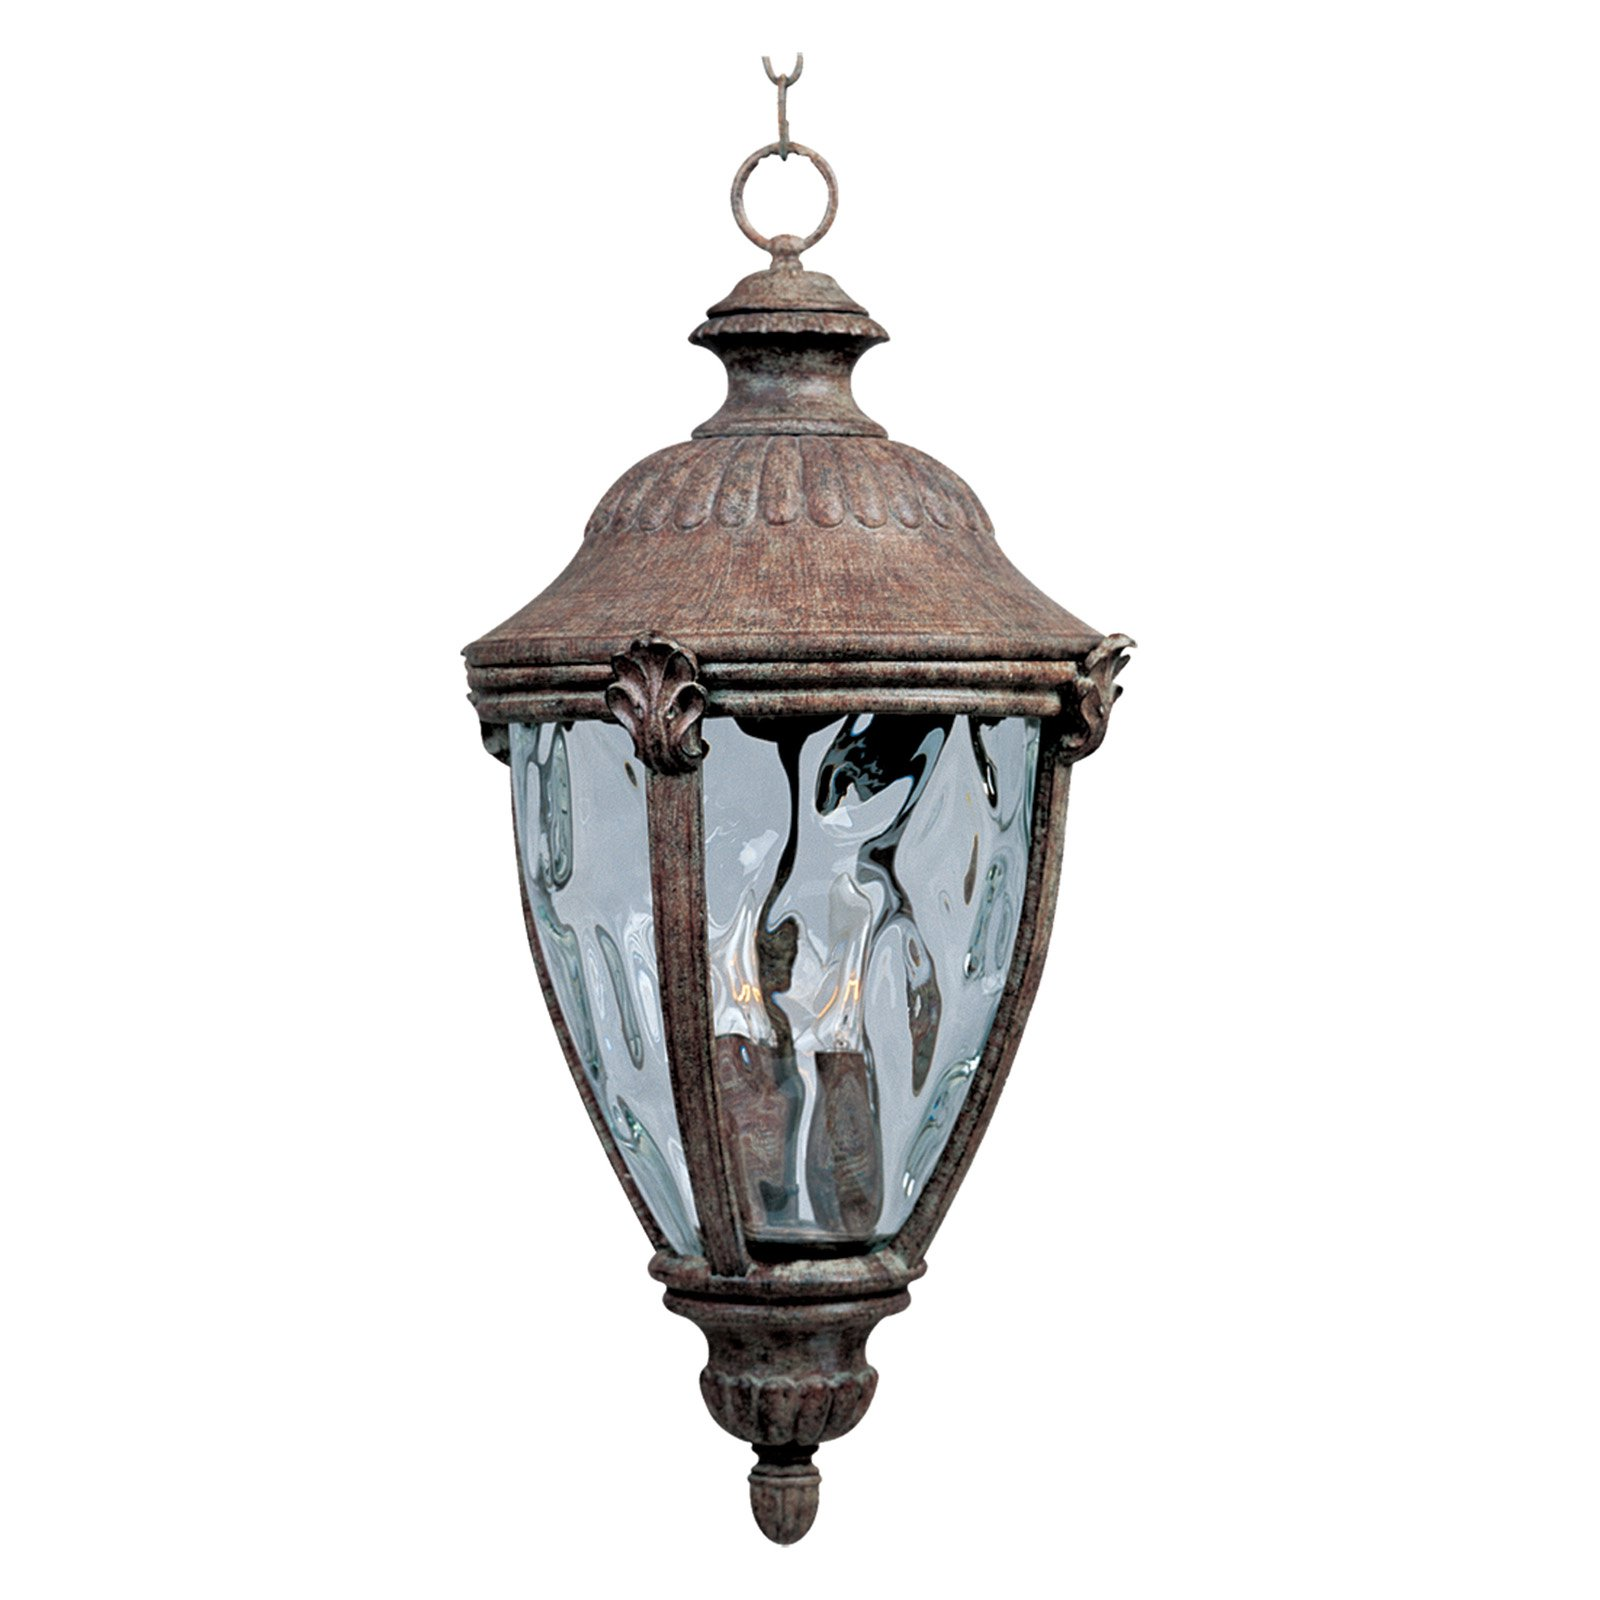 Maxim 40291WGET Morrow Bay VX Outdoor Hanging Lantern 10.5W in. Earth Tone by Maxim